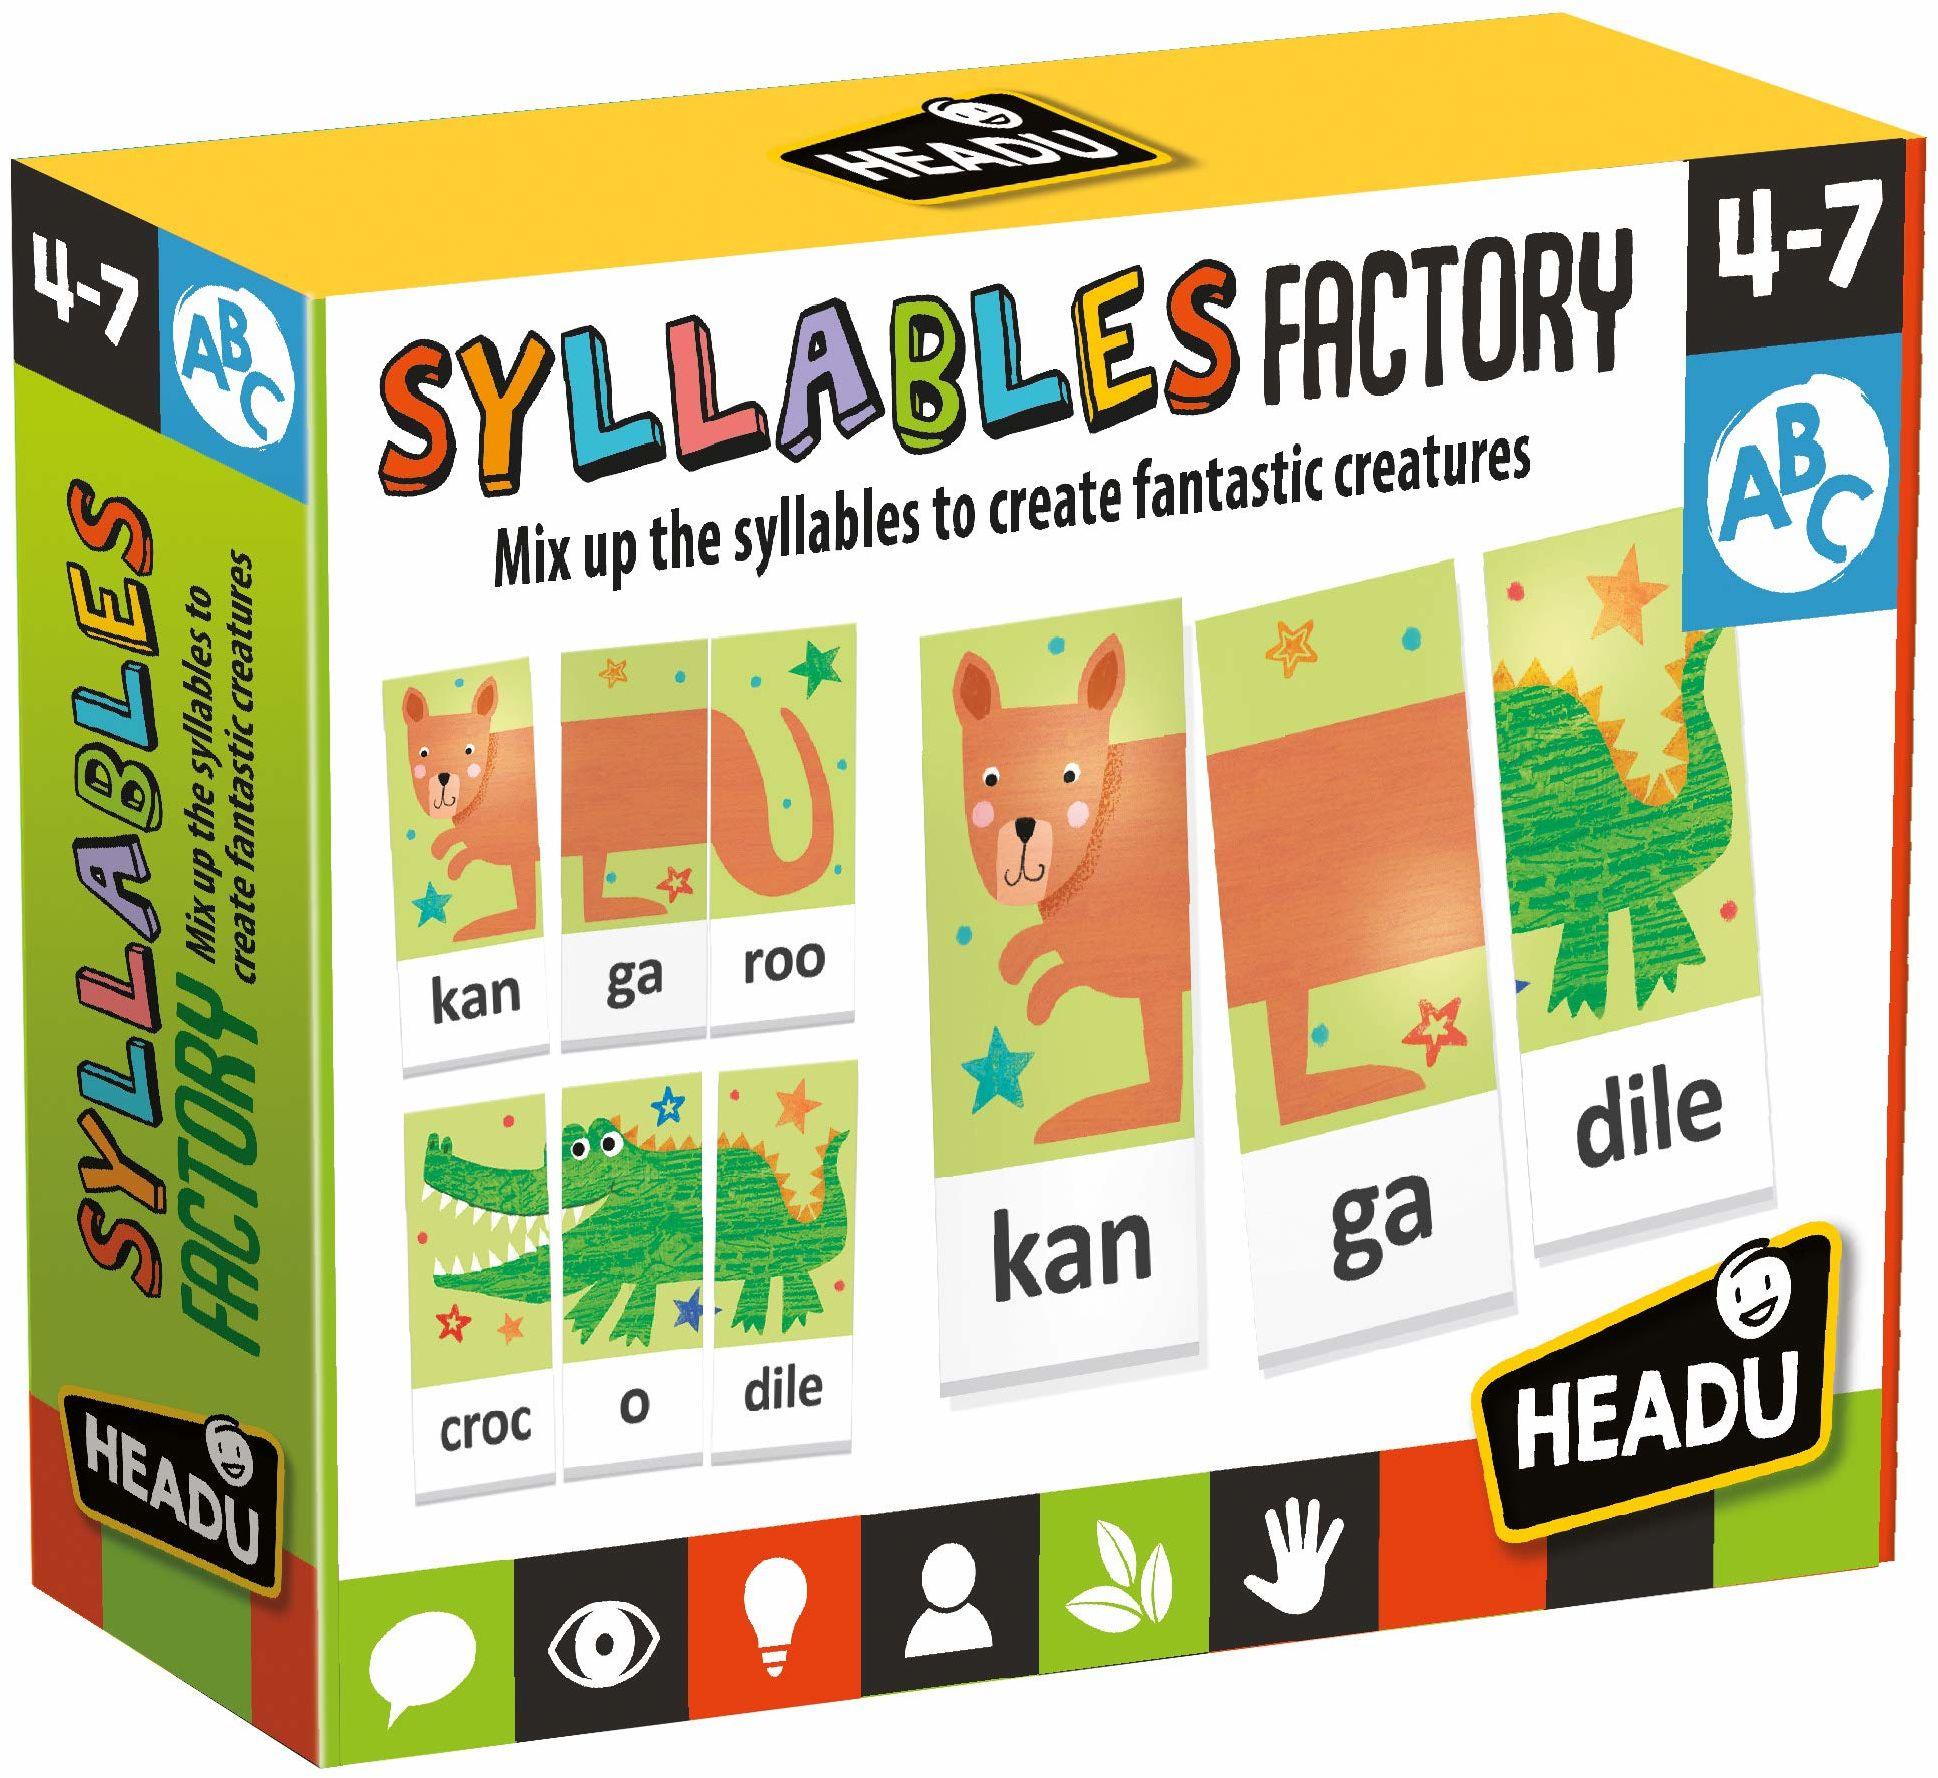 Russell EN24636 HEADU Syllables Factory Cards